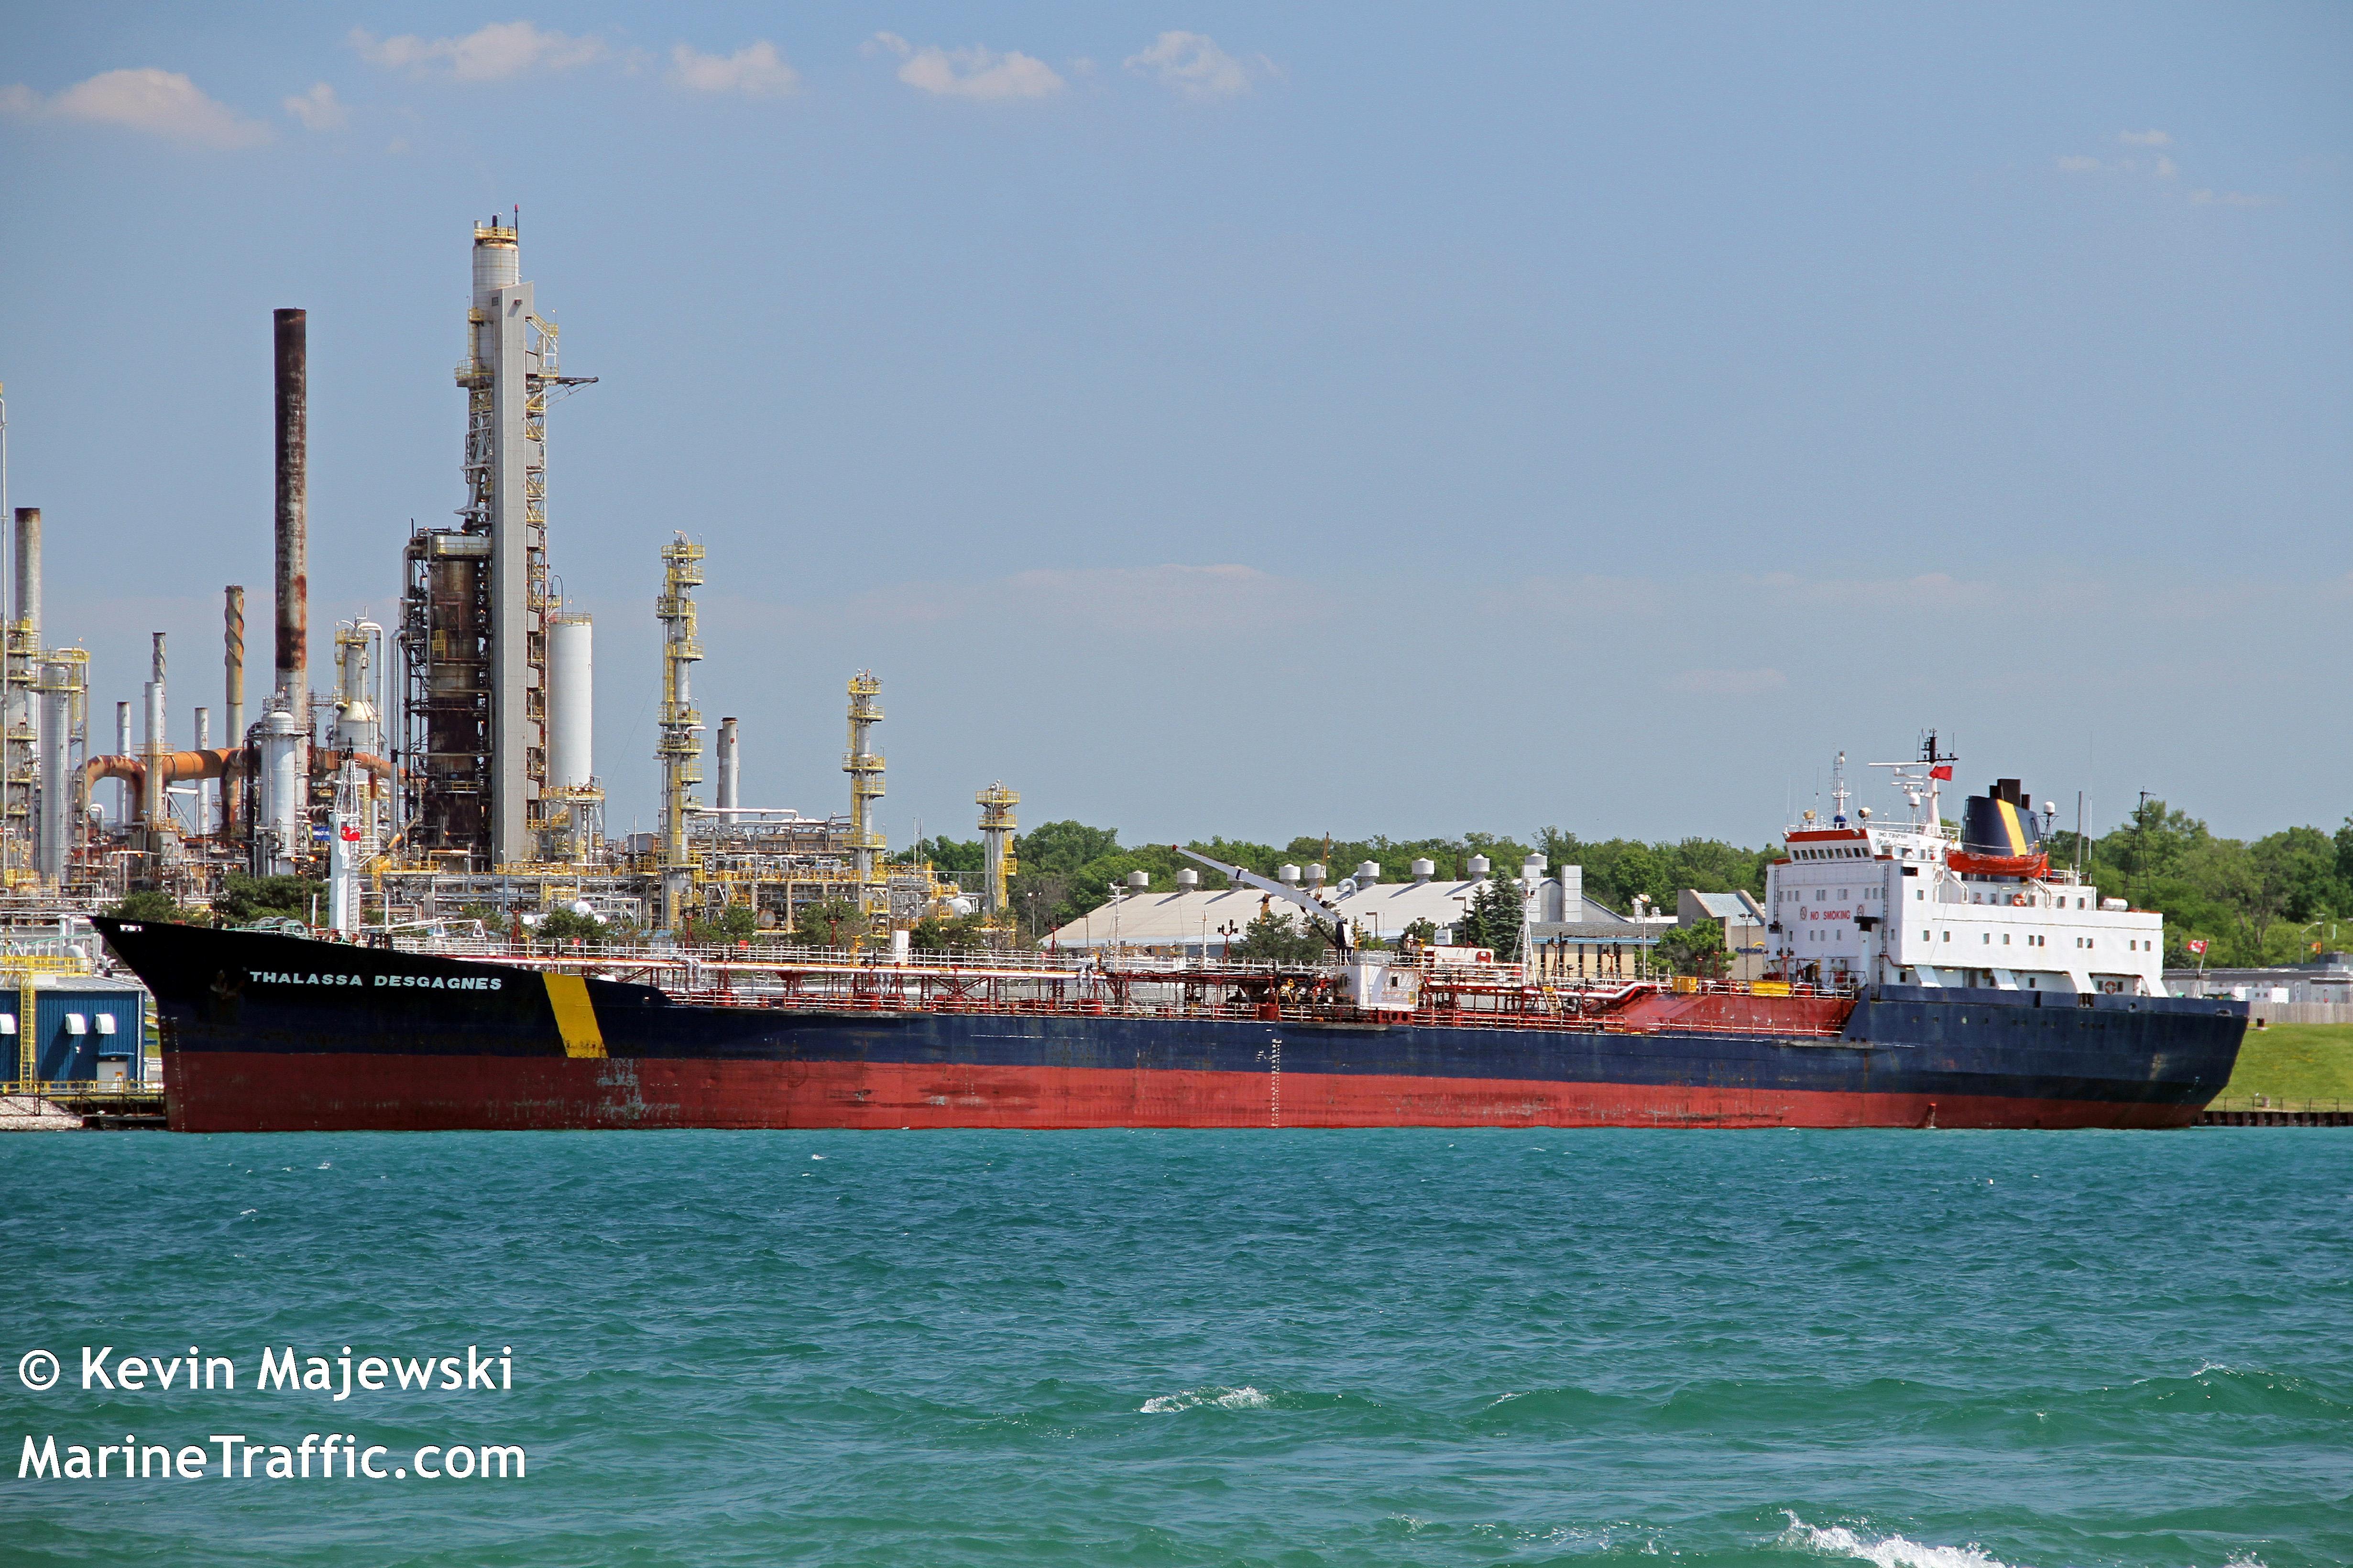 A handout image shows the Thalassa Desgagnes tanker, now called the Asphalt Princess, in Sarnia, Ontario, Canada June 19, 2016. Kevin D.Majewski/Handout via REUTERS